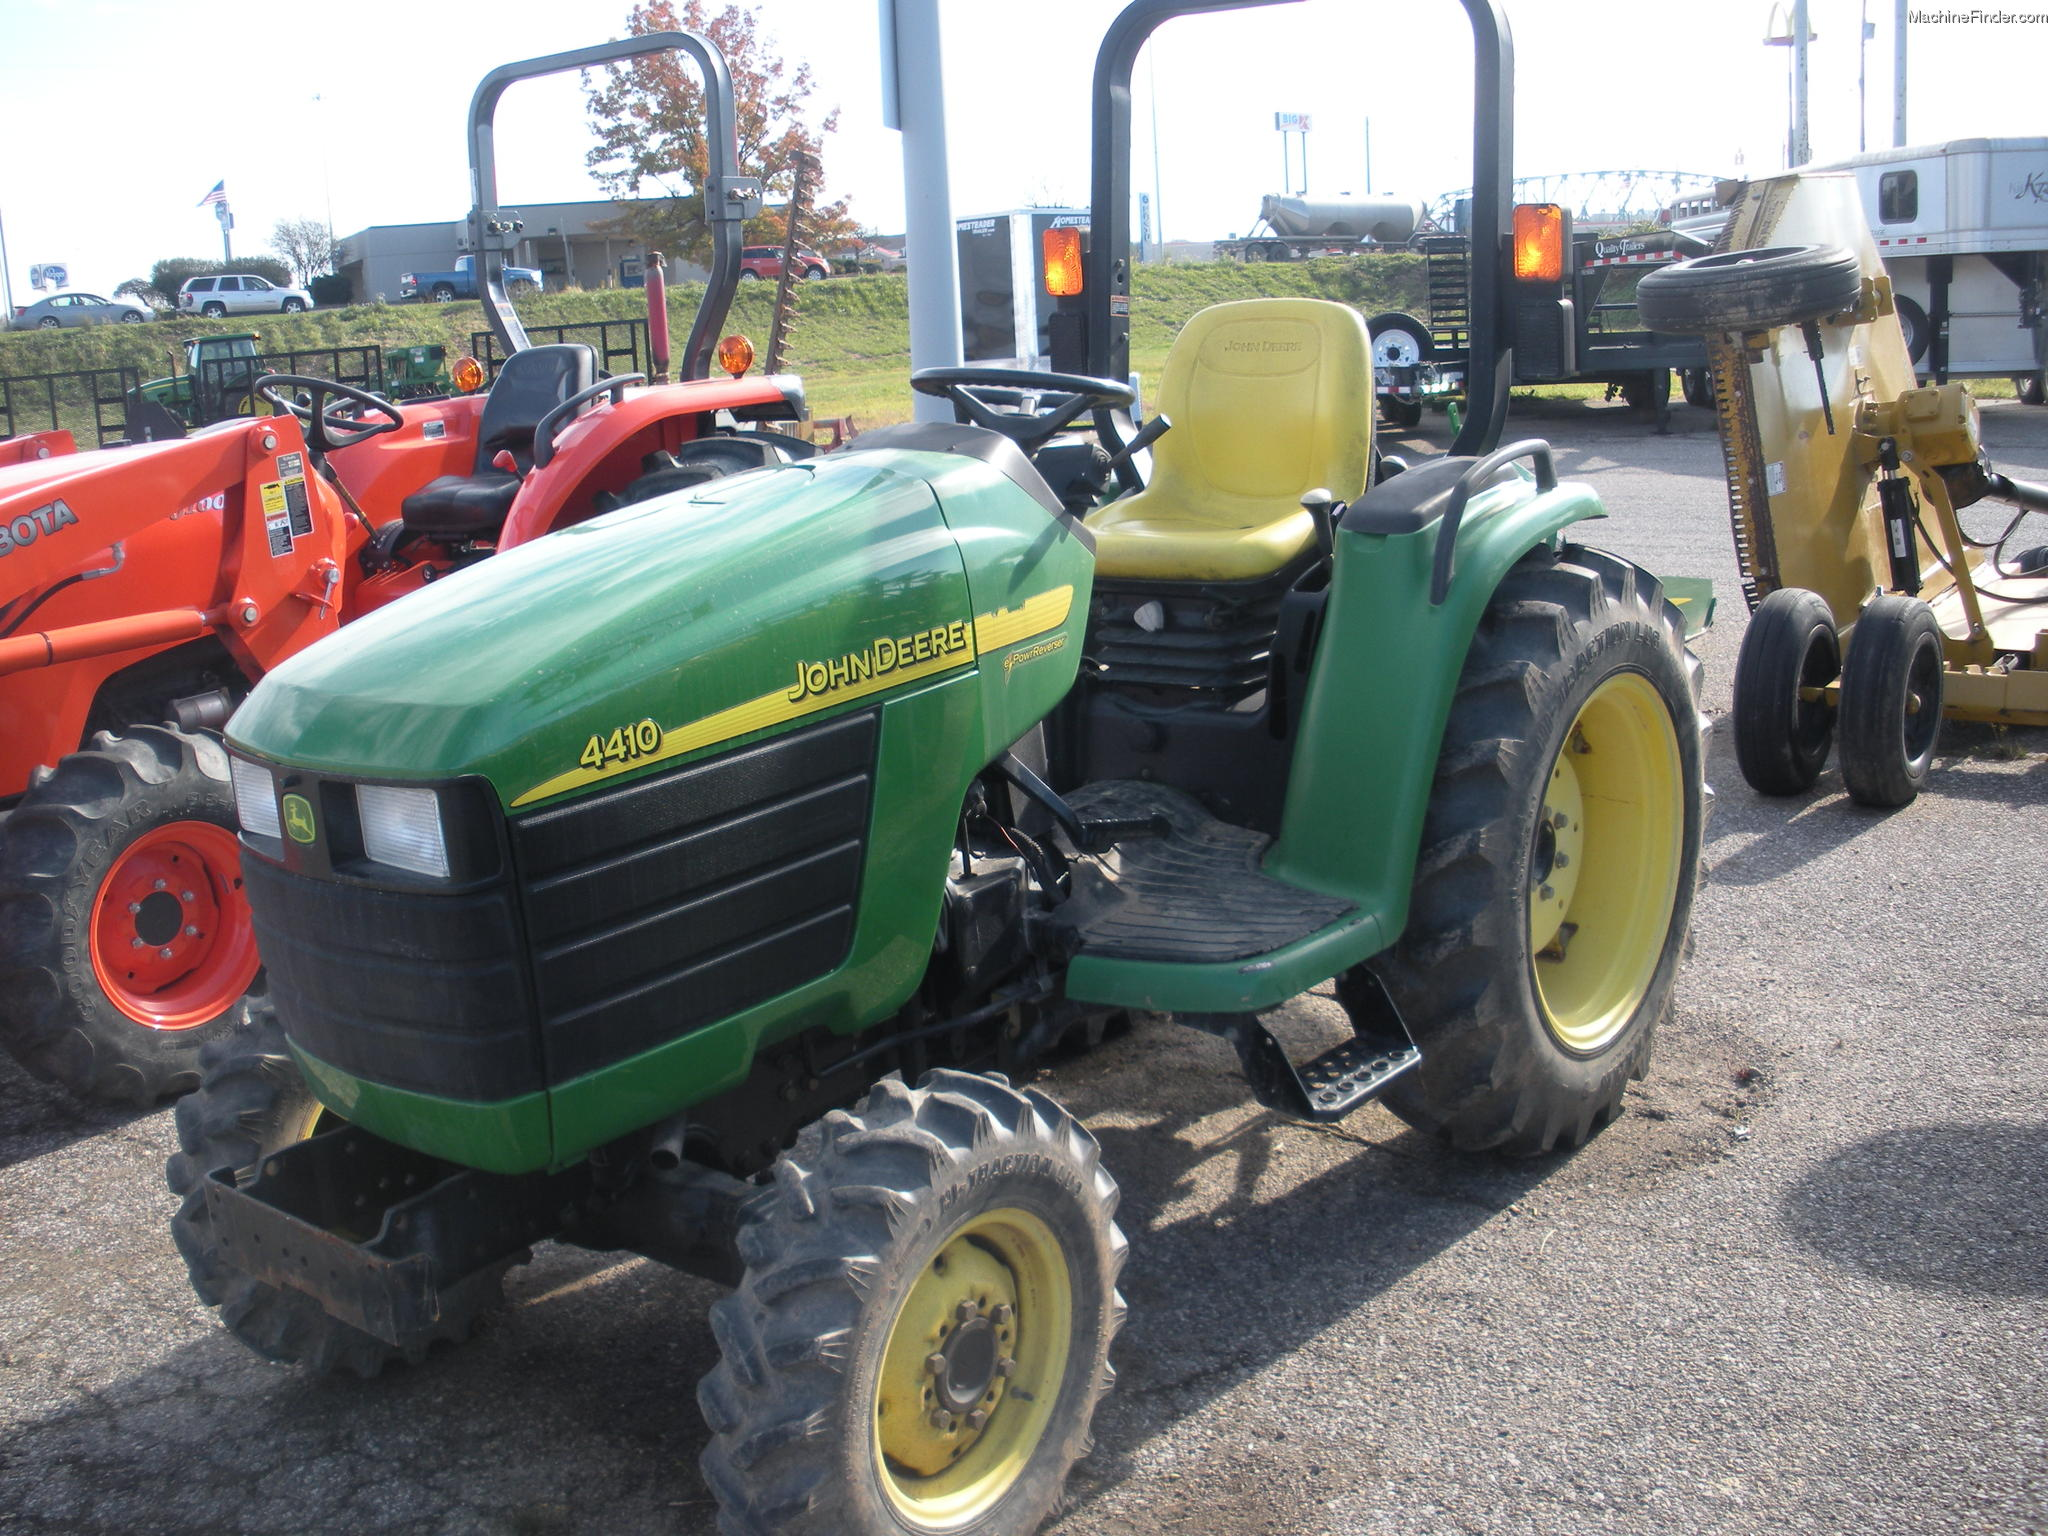 2002 John Deere 4410 Tractors - Compact (1-40hp.) - John ...